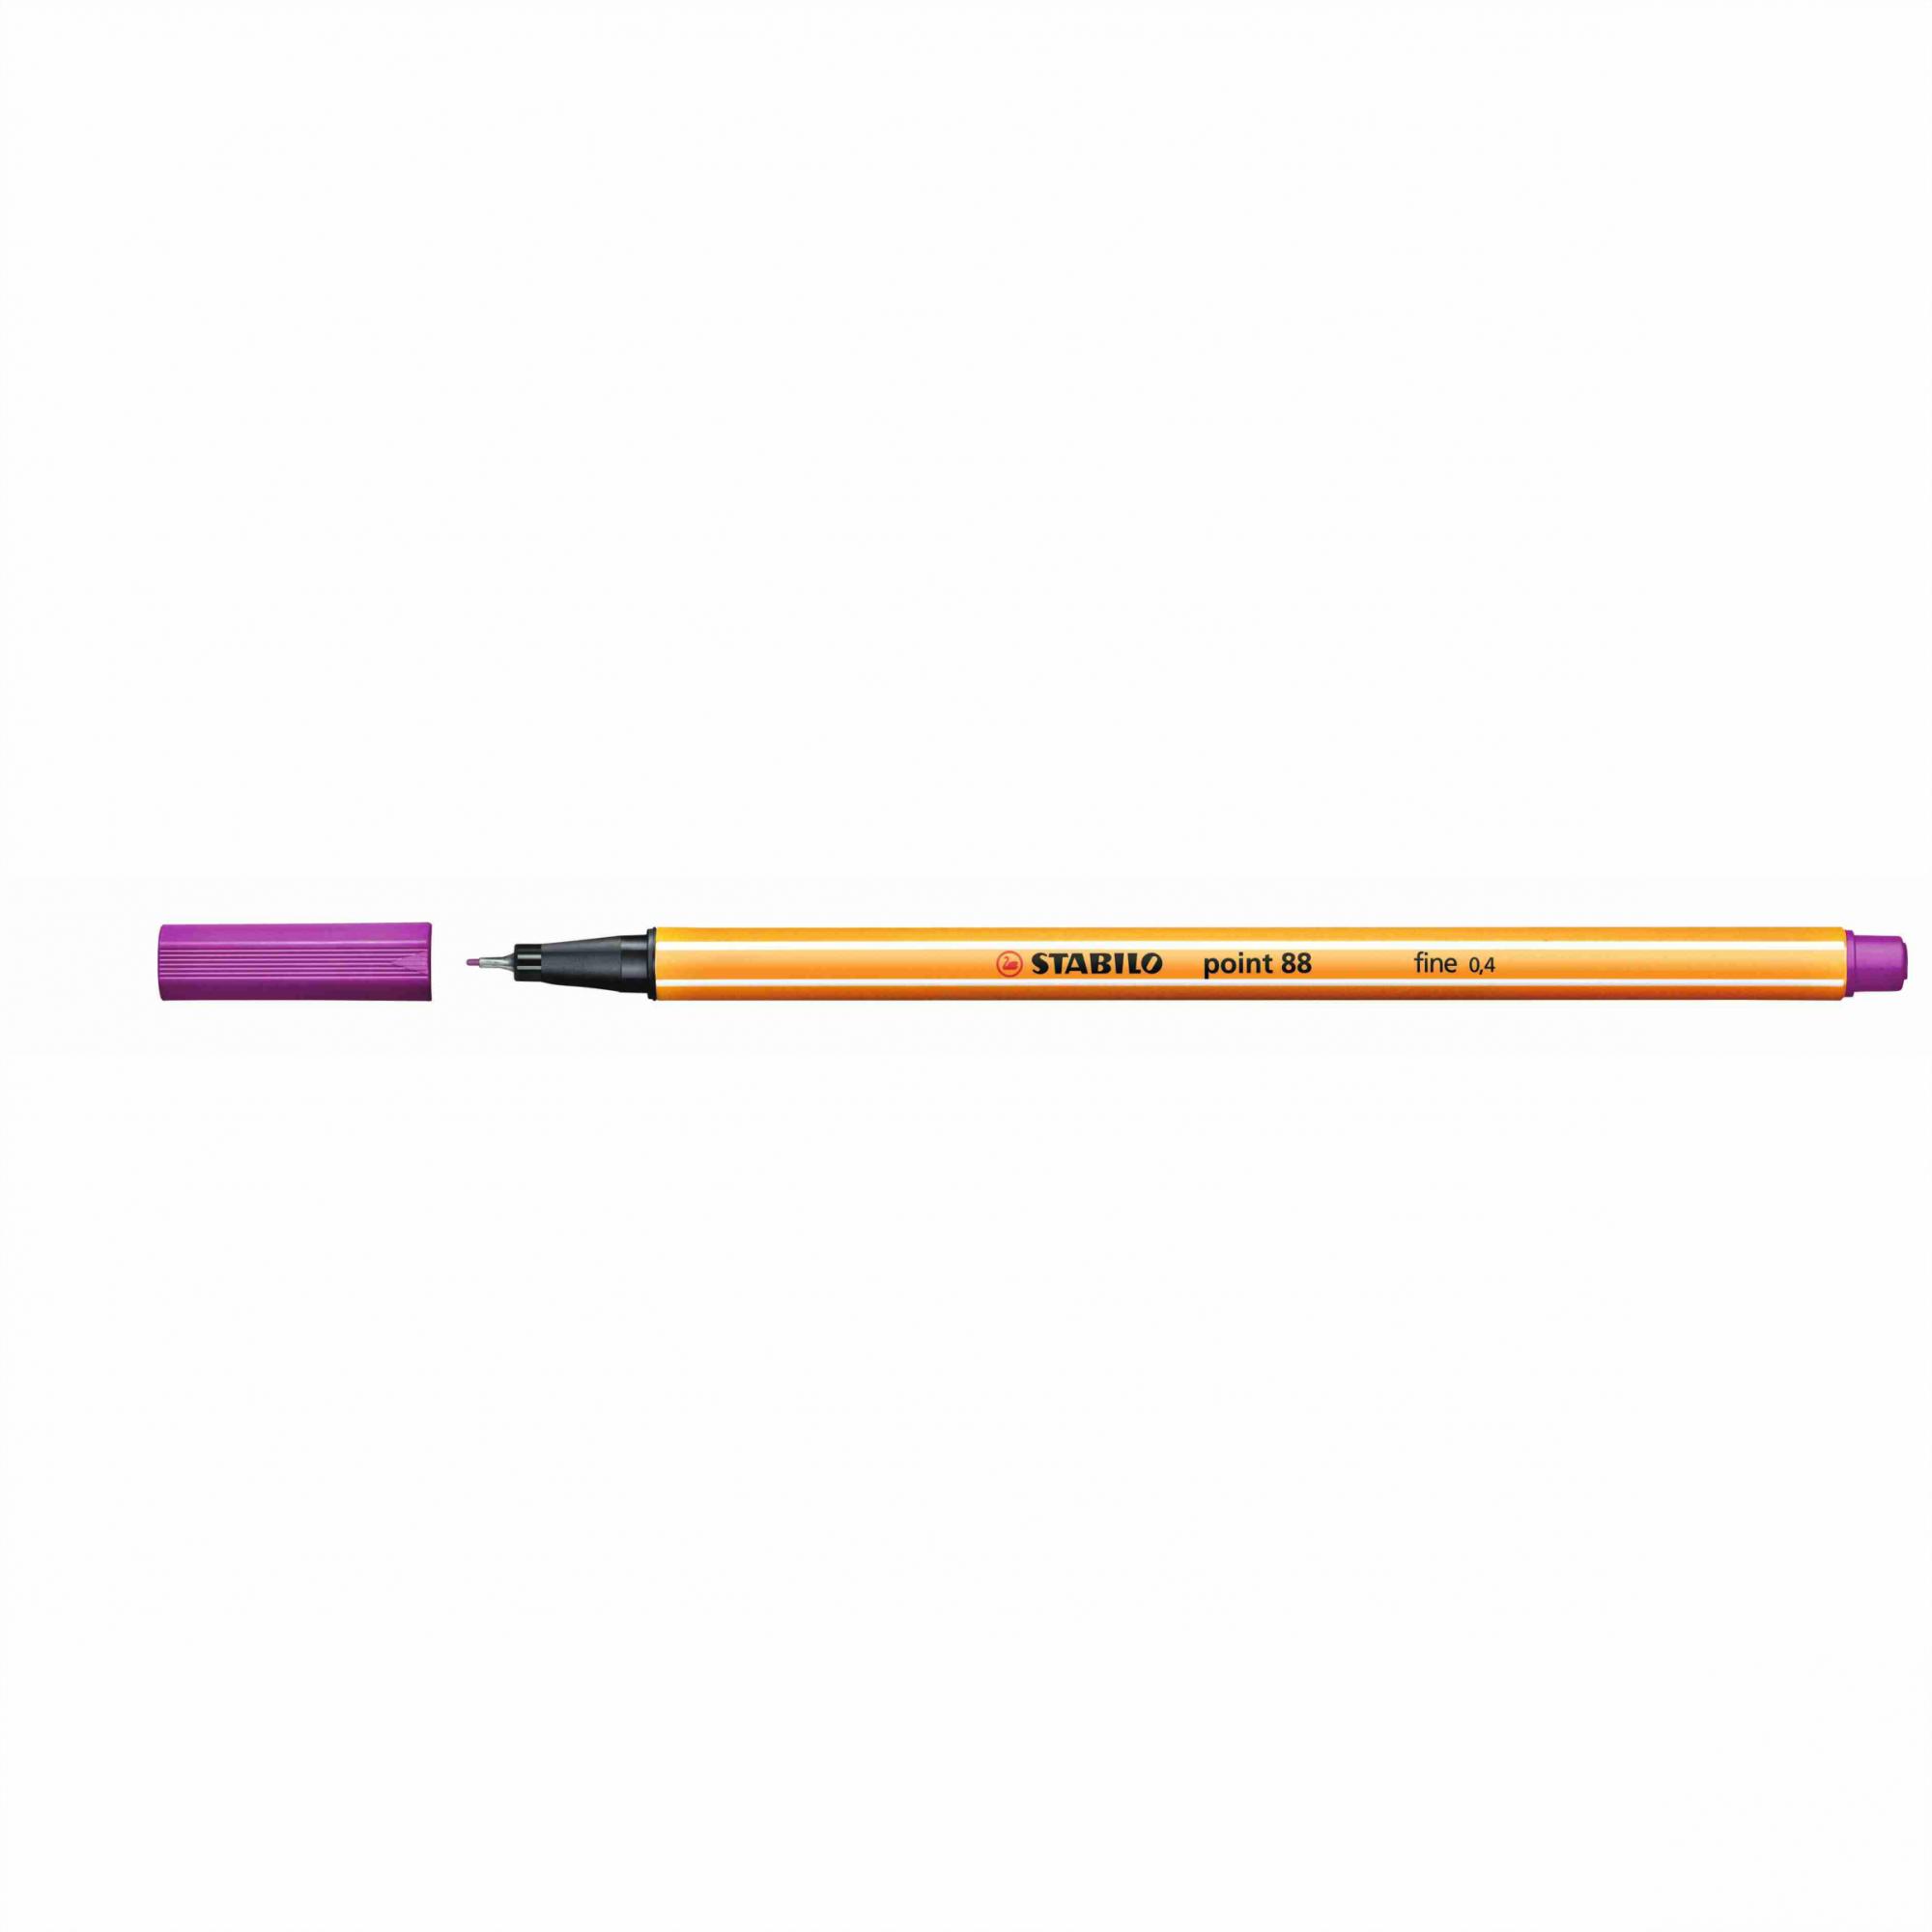 Caneta Hidrográfica 0.4 lilás POINT 88 Stabilo